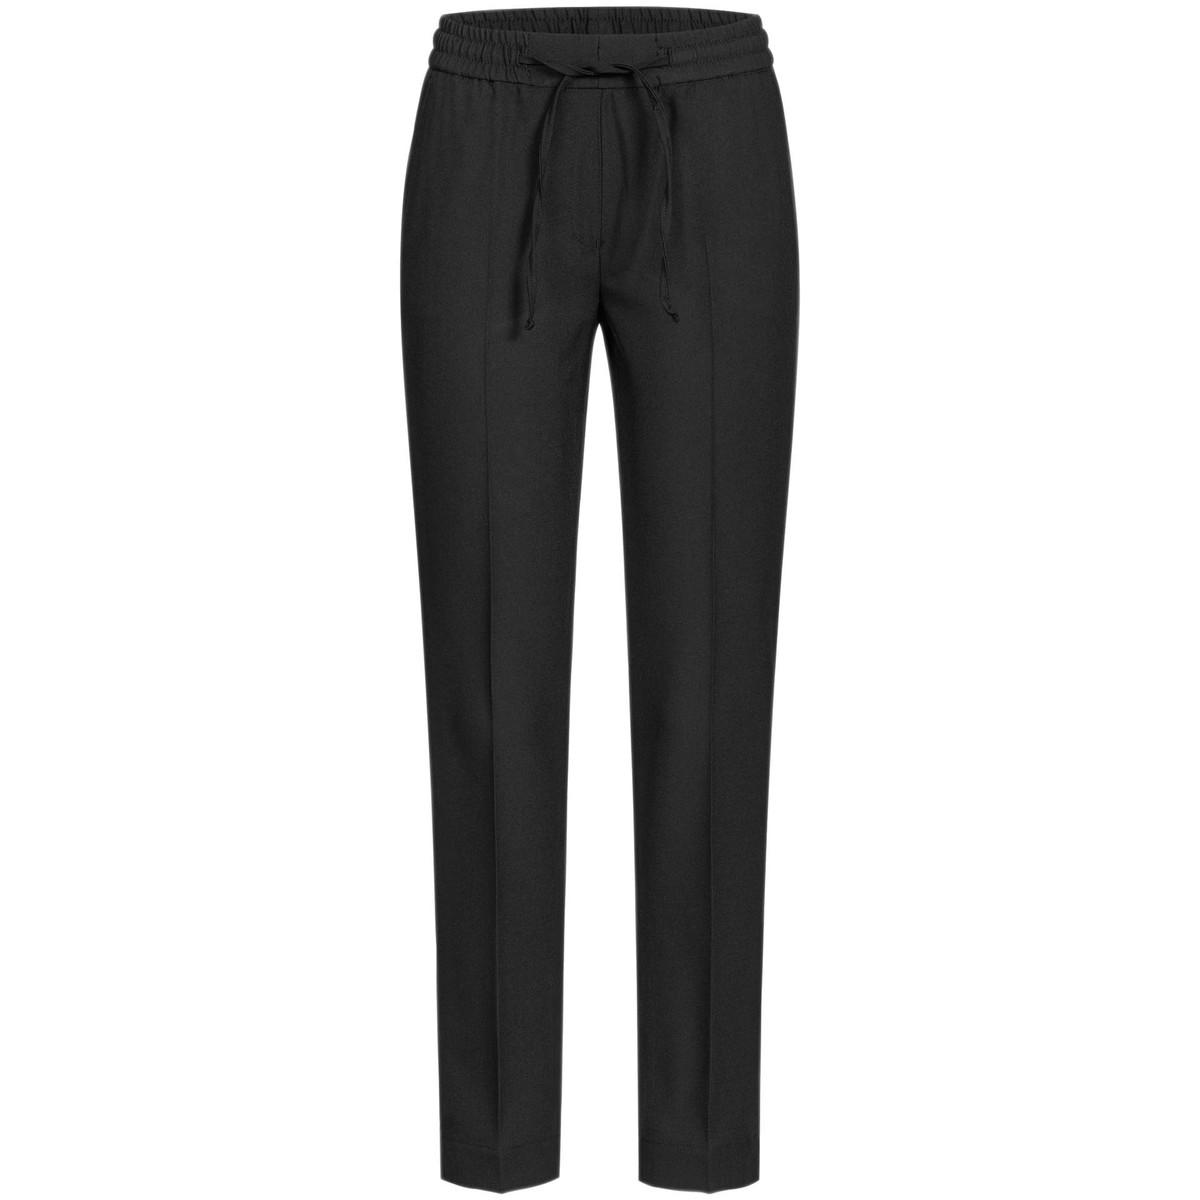 "Damen-Hose ""Joggpants"" schwarz Größe 36"